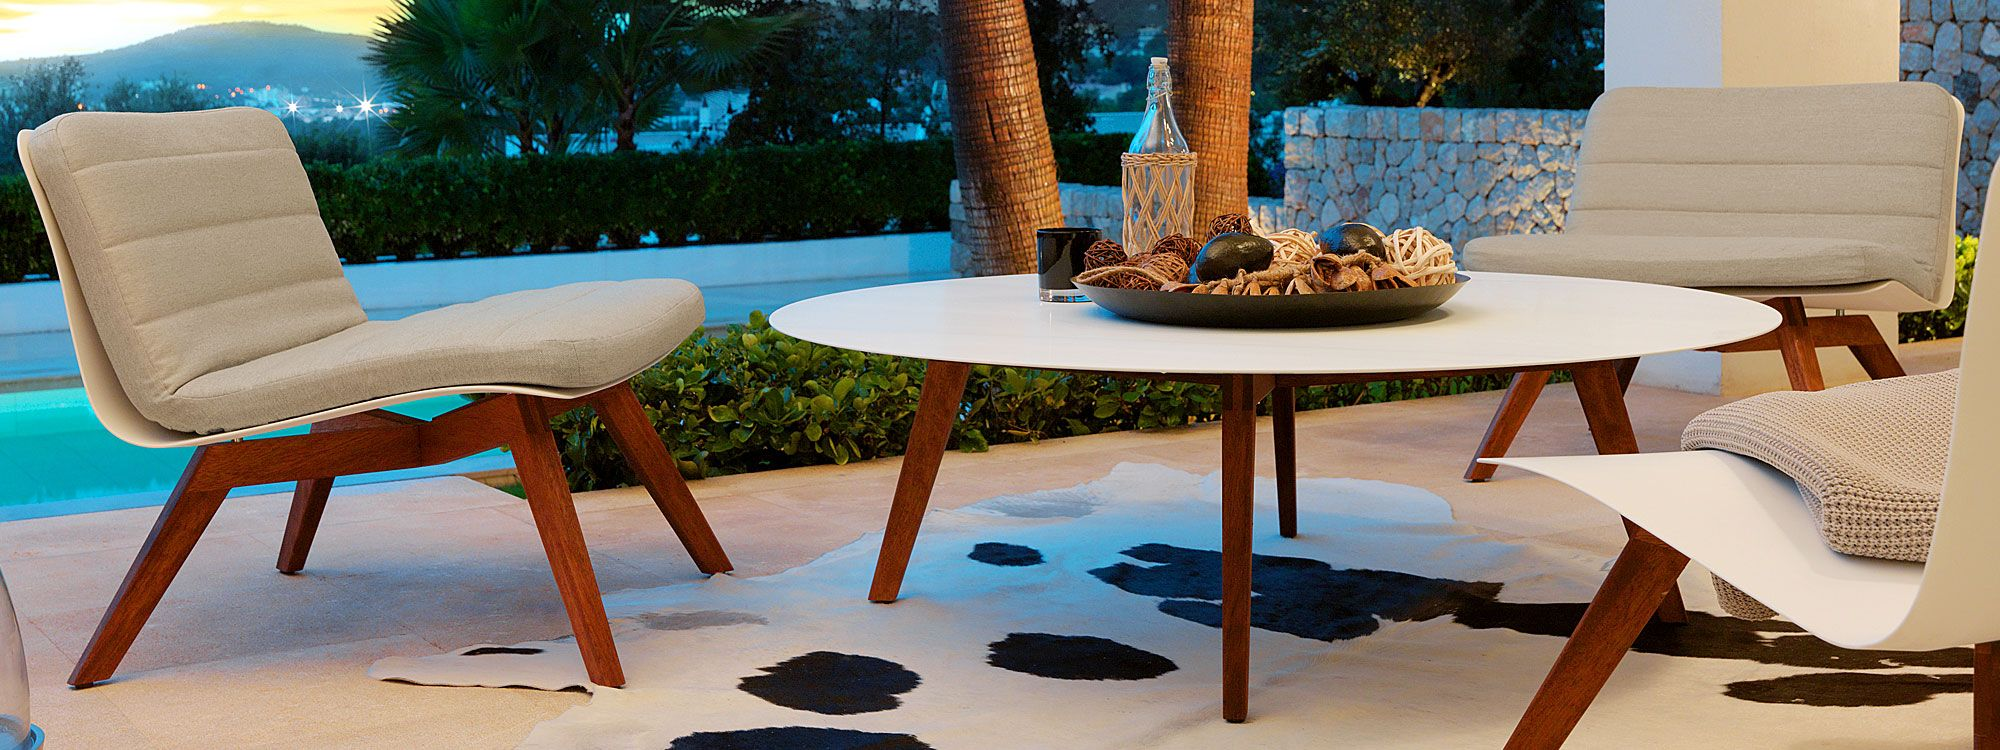 VITEO SLIM MODERN Outdoor LOUNGE Furniture | Luxury Design GARDEN Furniture  By Wolfgang Pichler | ARCHITECTURAL